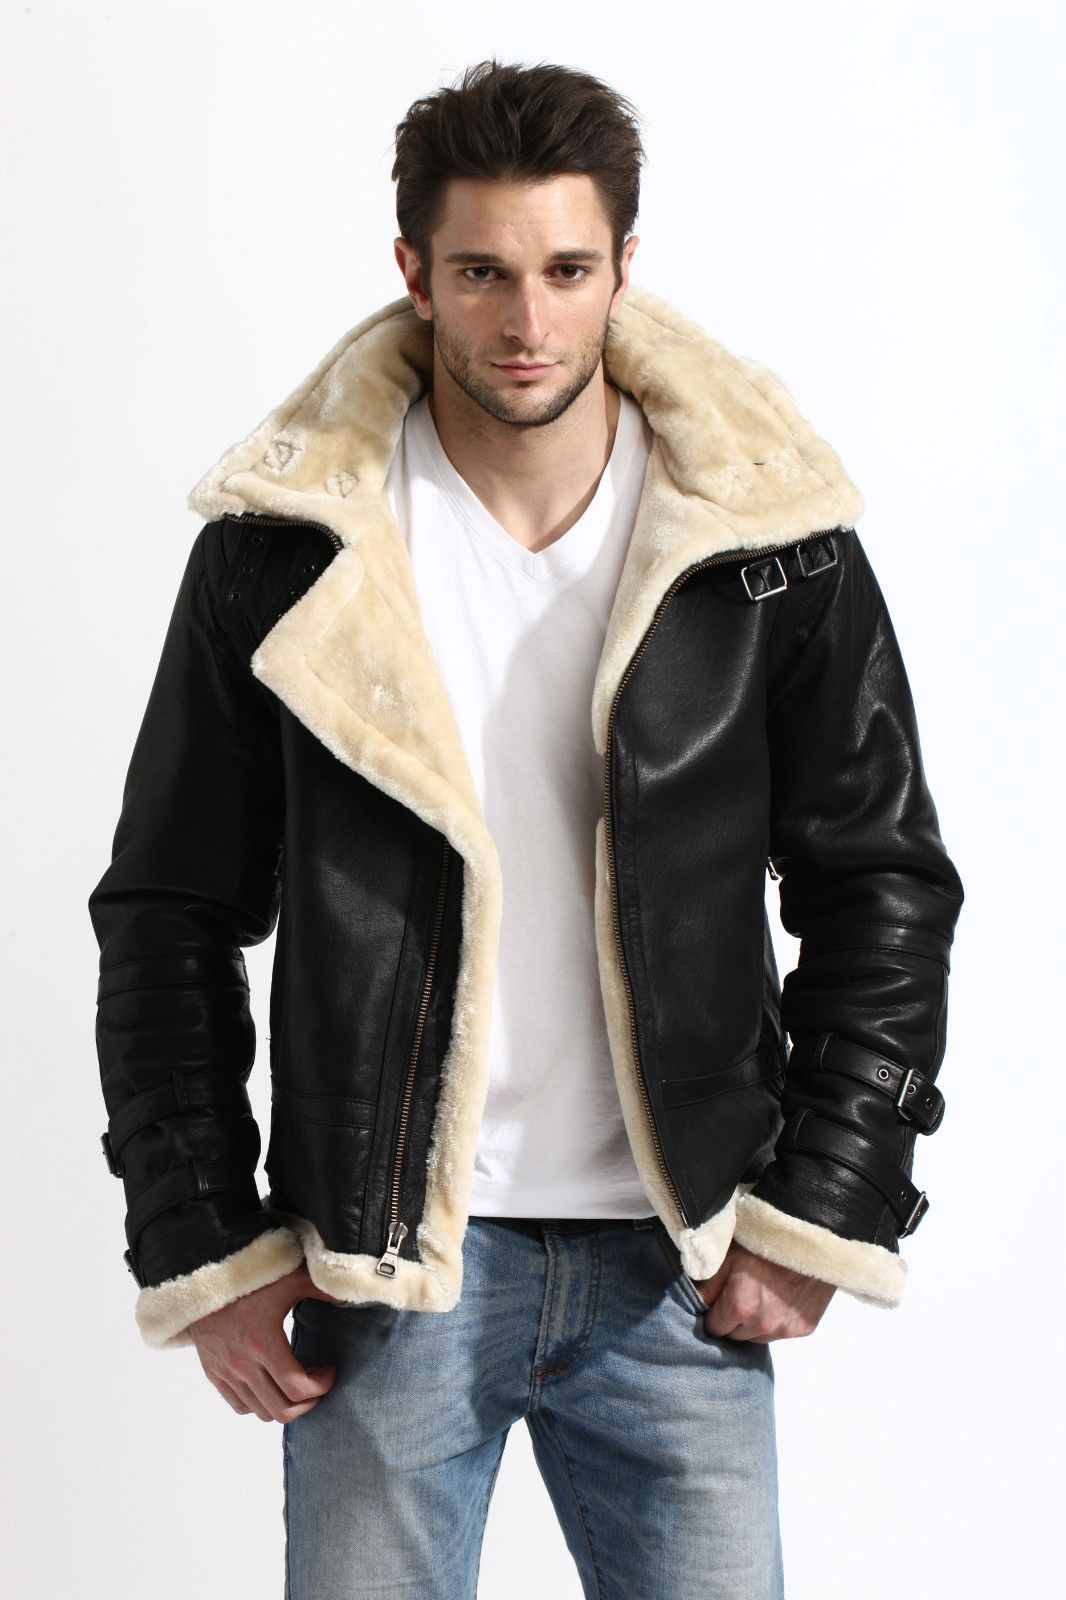 Mens Premium Lambskin Genuine Leather Bomber Jacket Removable Hood Shearling Chaqueta De Cuero Hombre Ropa De Hombre Combinacion De Ropa Hombre [ 1600 x 1066 Pixel ]